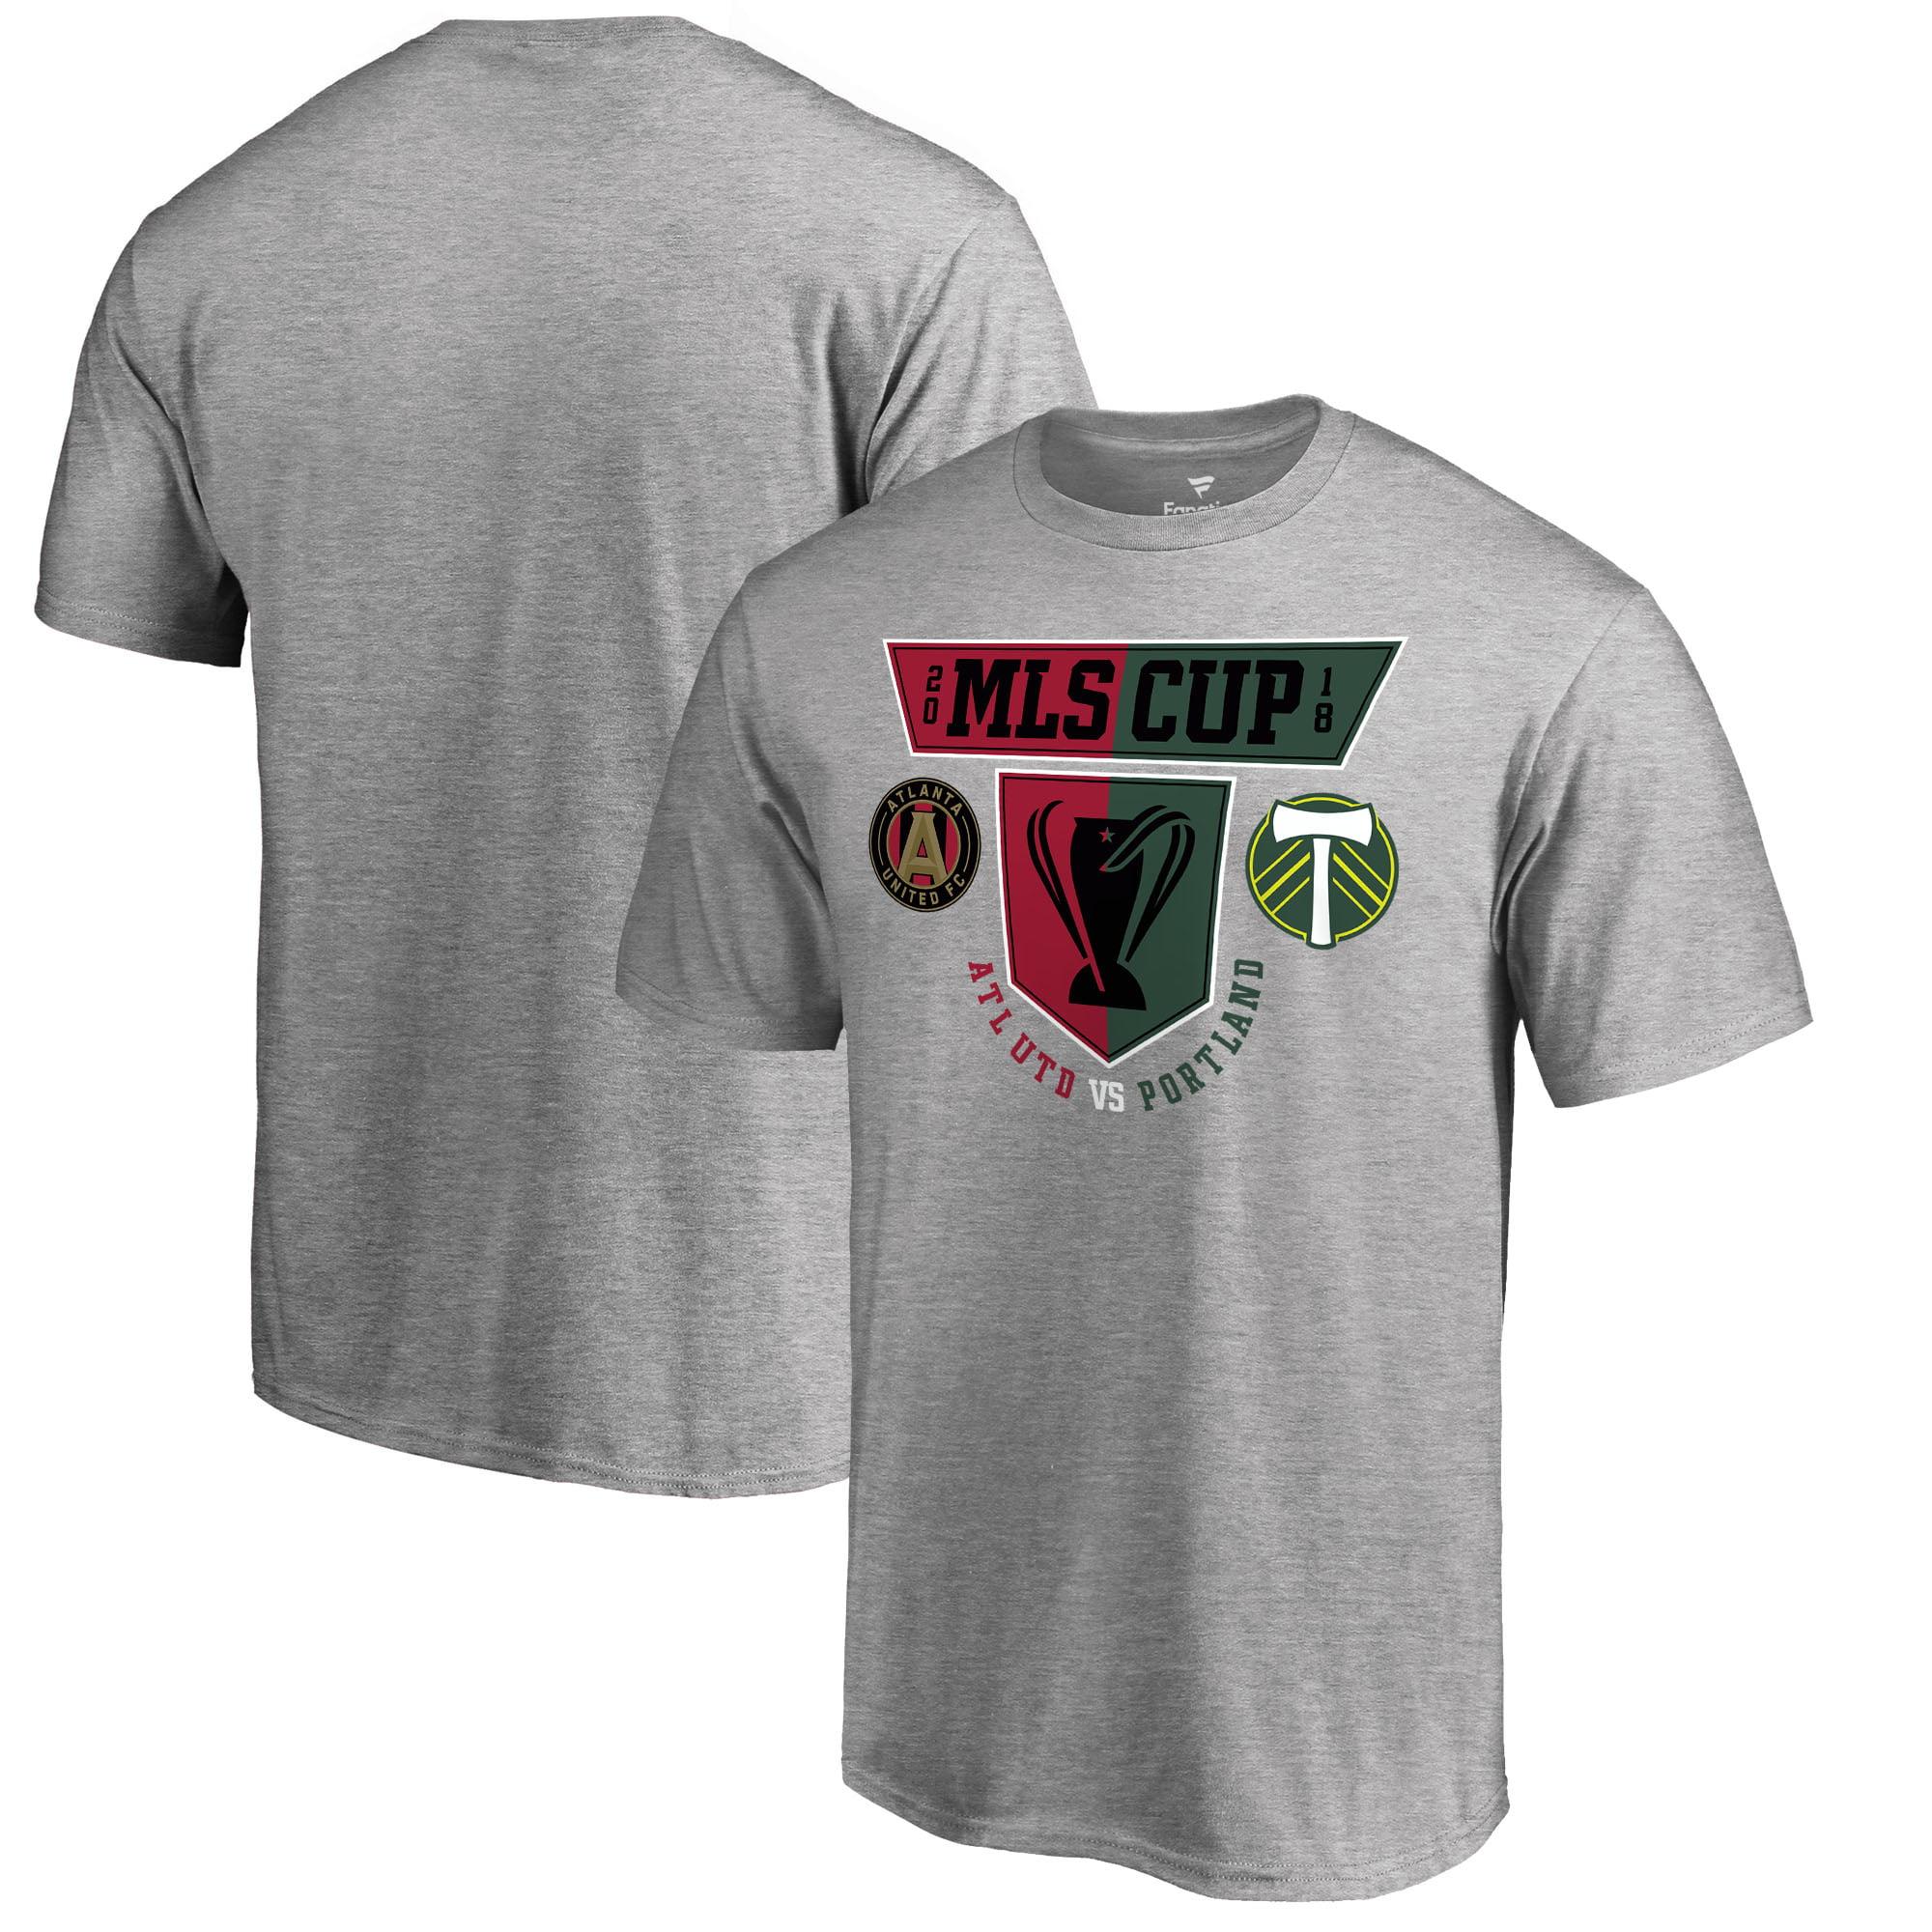 Atlanta United FC vs. Portland Timbers Fanatics Branded 2018 MLS Cup Matchup T-Shirt - Heather Gray